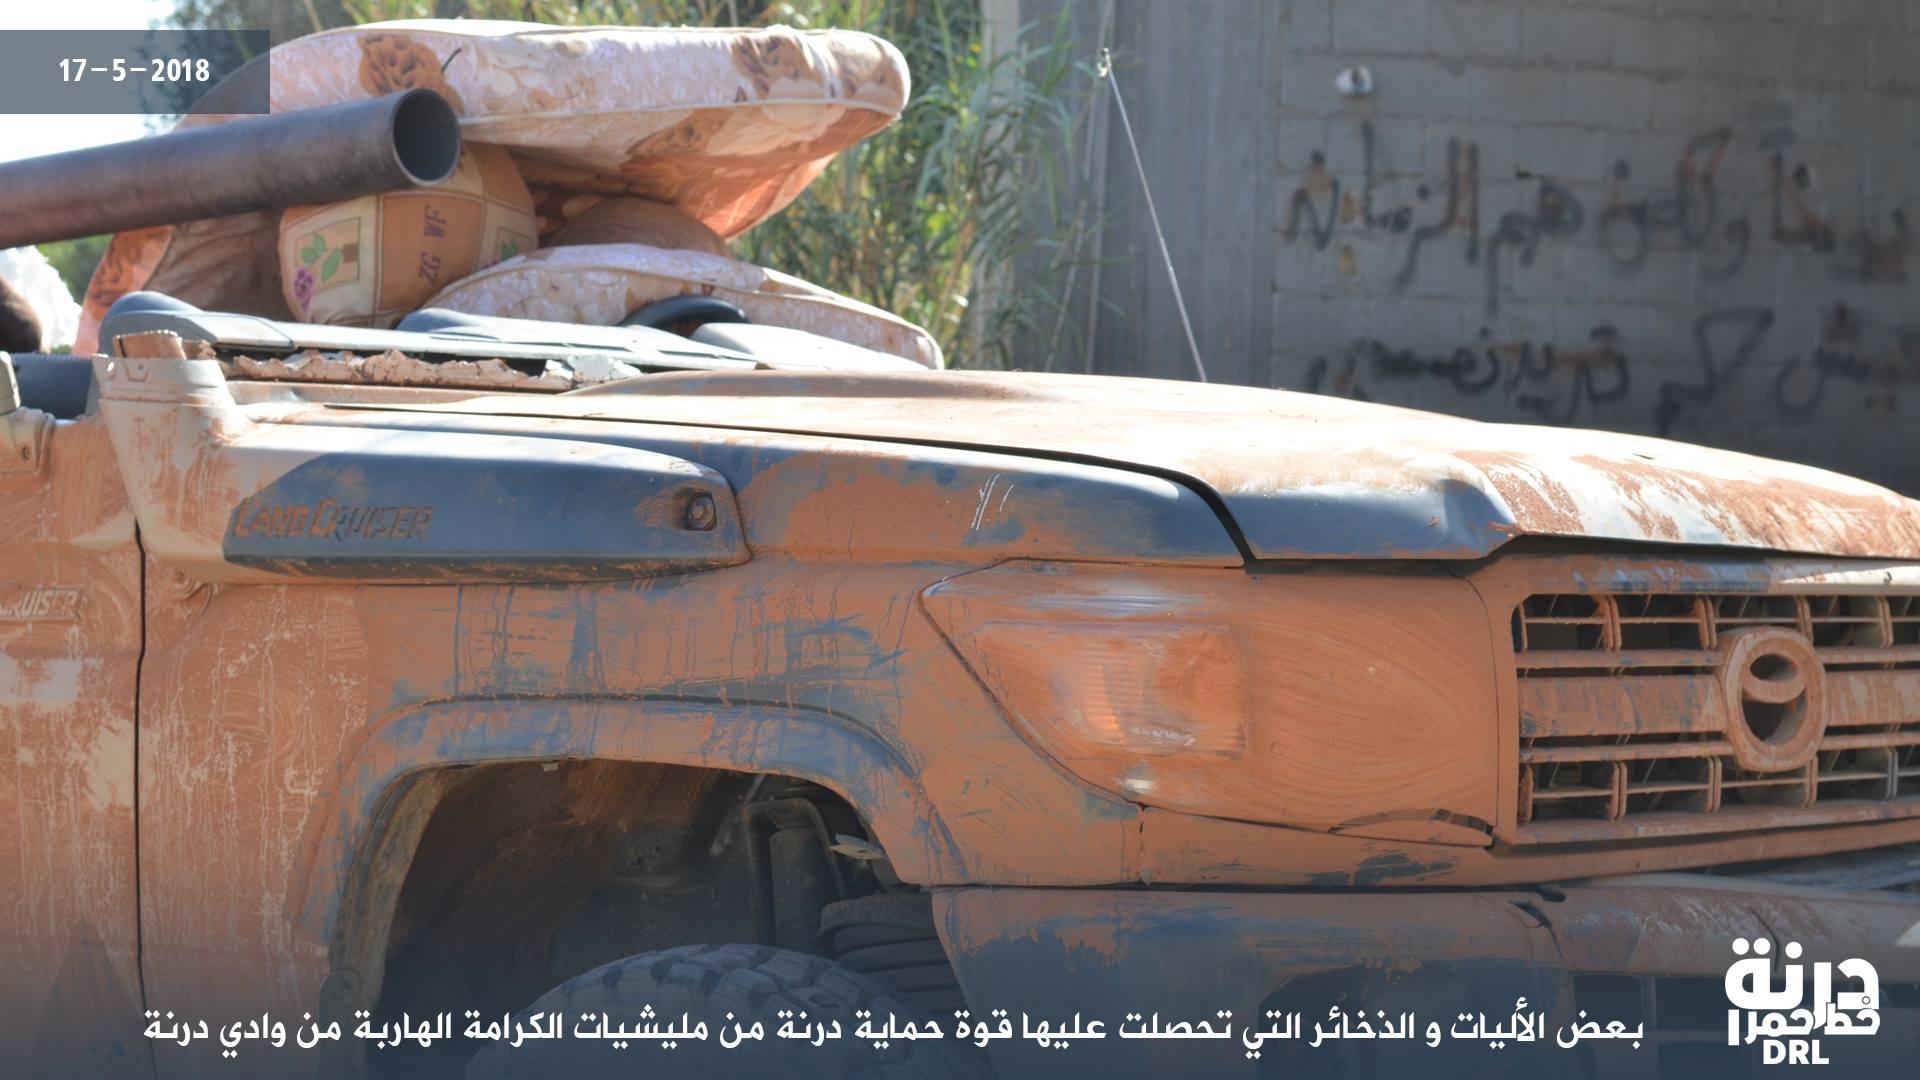 Derna Militants Repel Libyan Army's Attack, Capture Several Vehicles (Photos)